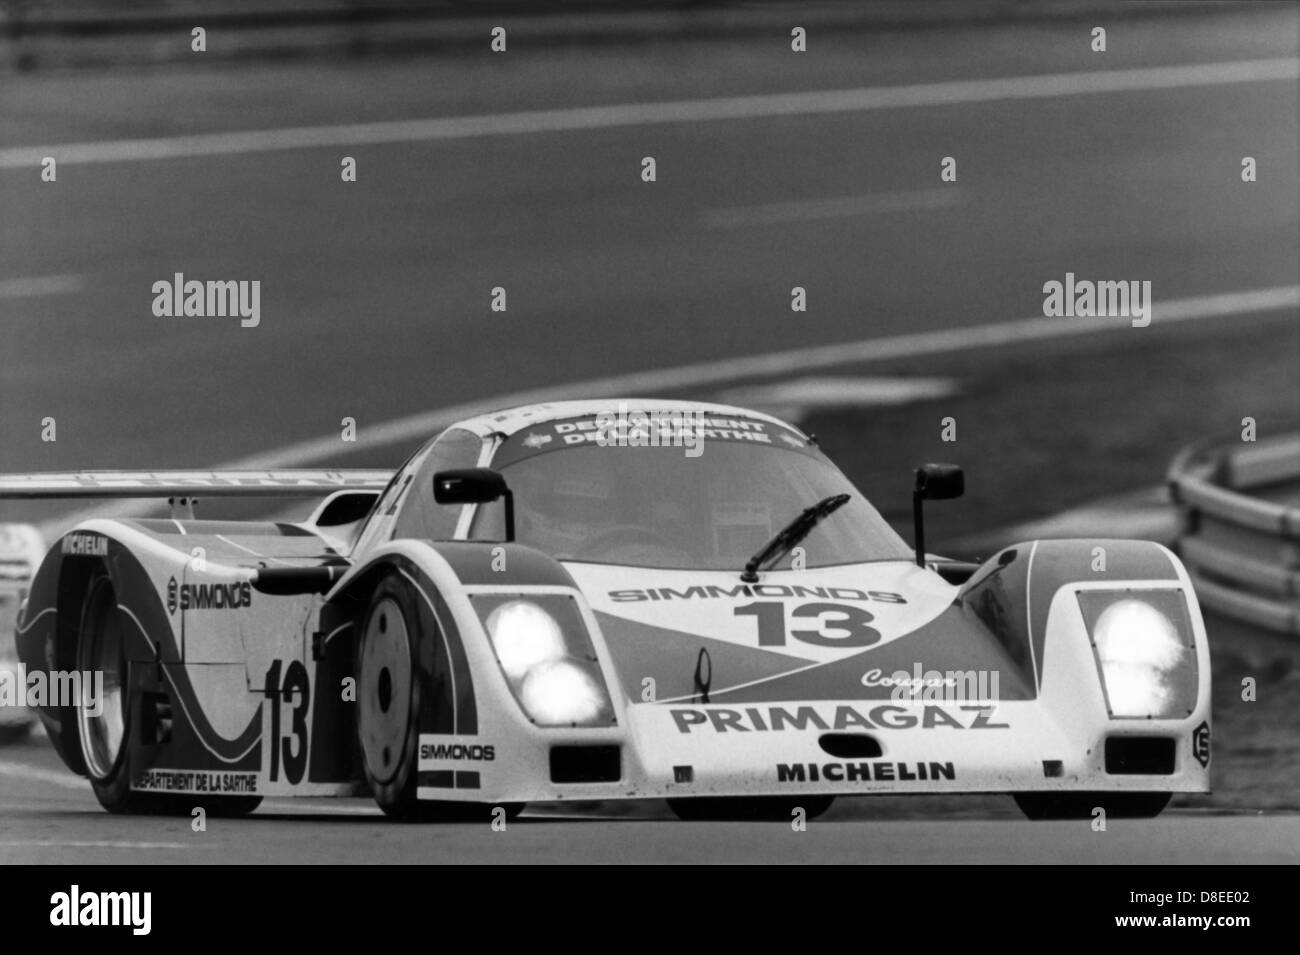 24 H of Le Mans 1986,Raphanel / De Cadenet / Courage,Primagaz Team Cougar,CougarC12 - Stock Image